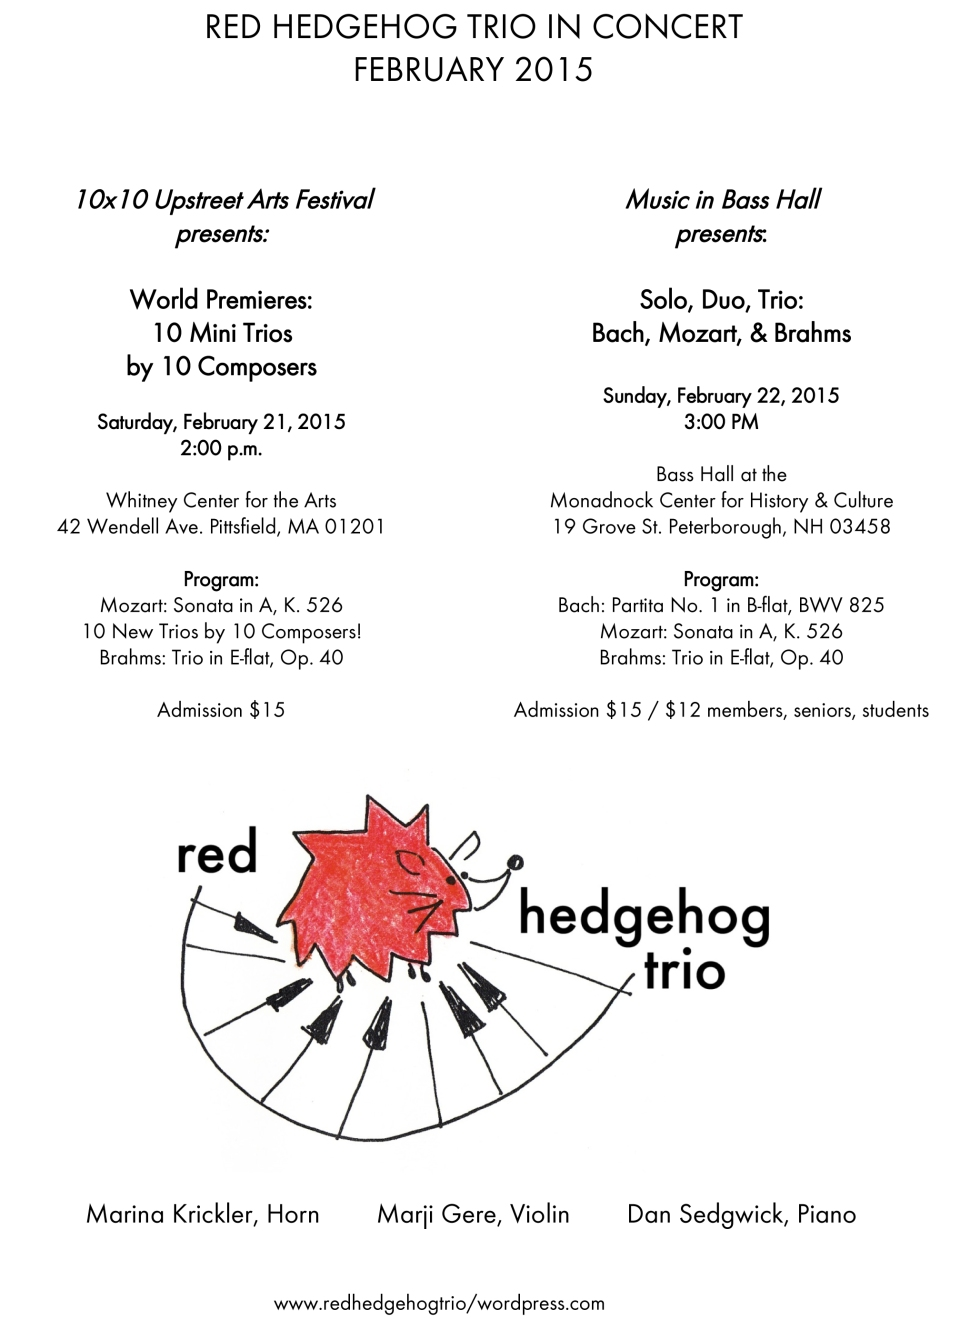 Feb Concert Poster